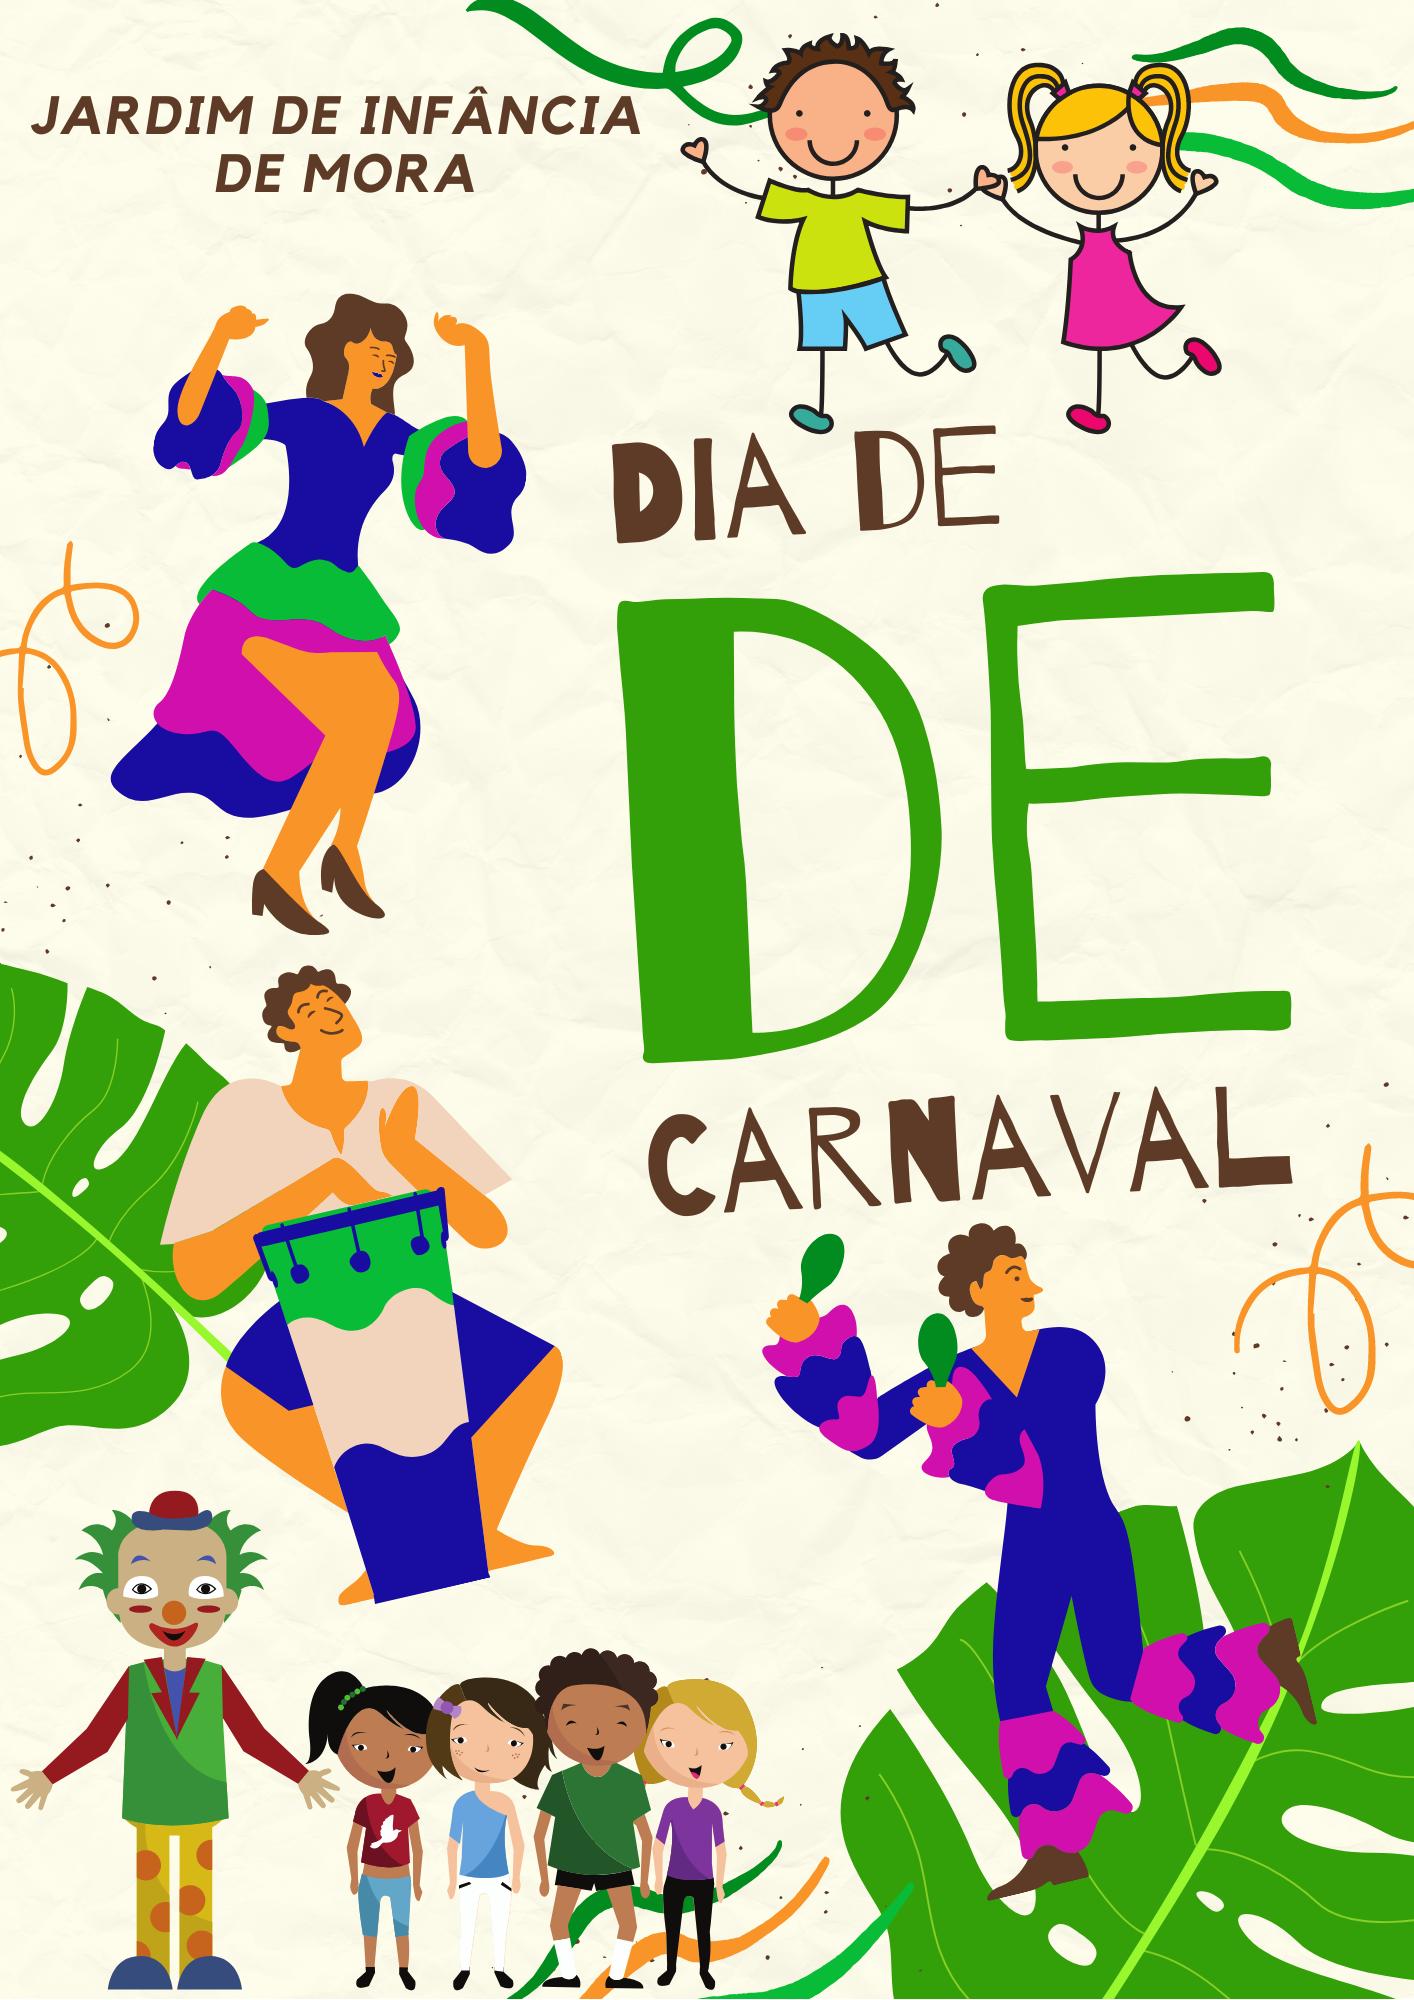 .: Dia de Carnaval .:. J.I. Mora :.